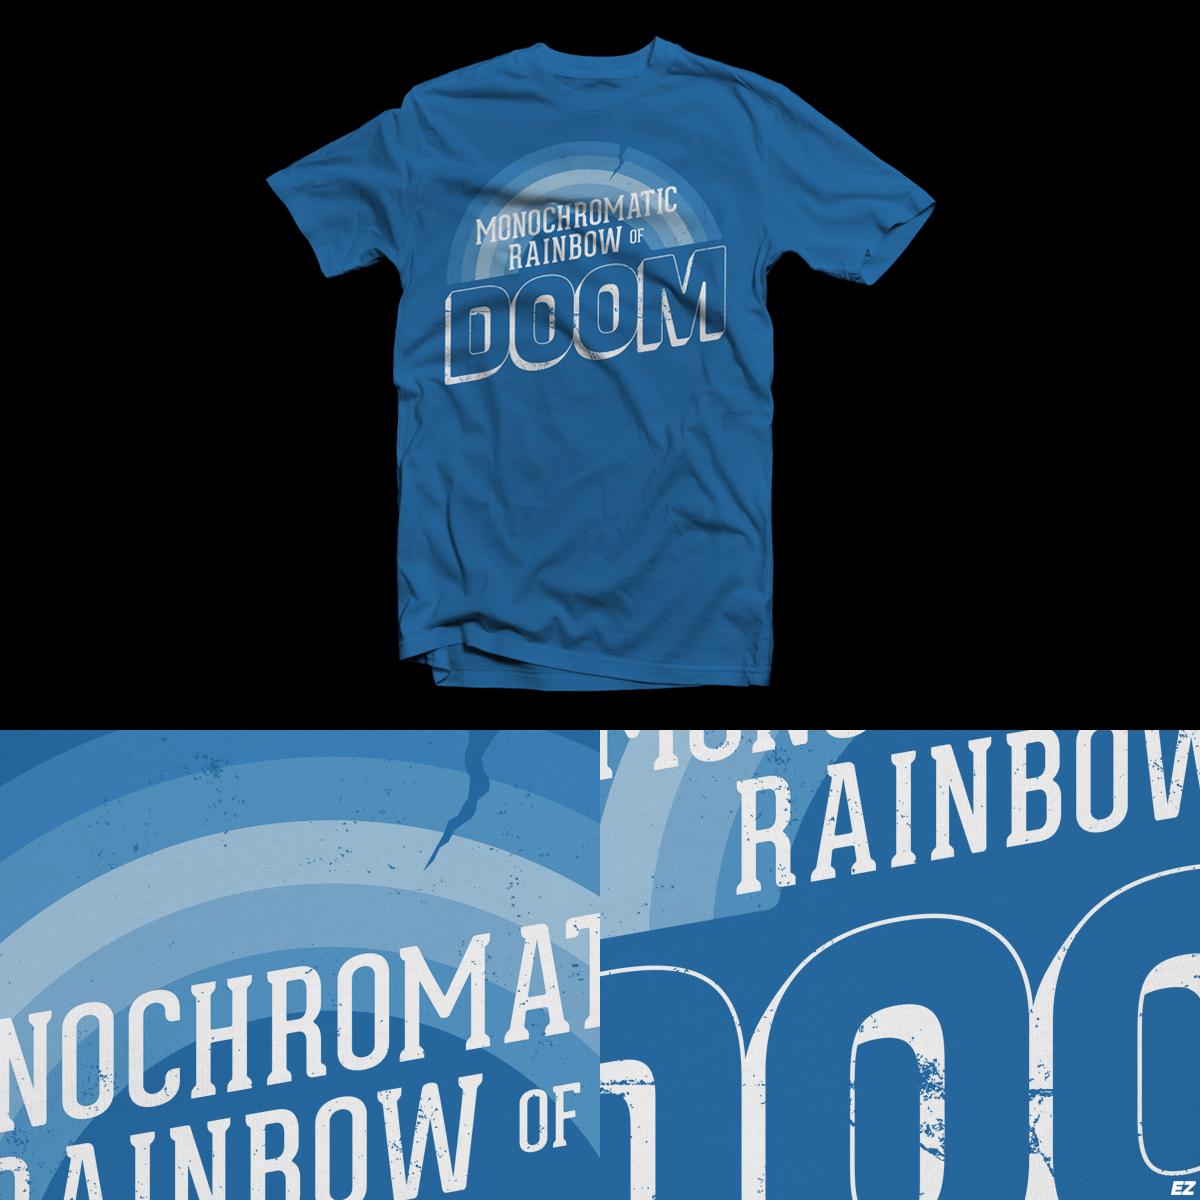 Rainbow of Doom by EZFL on Threadless